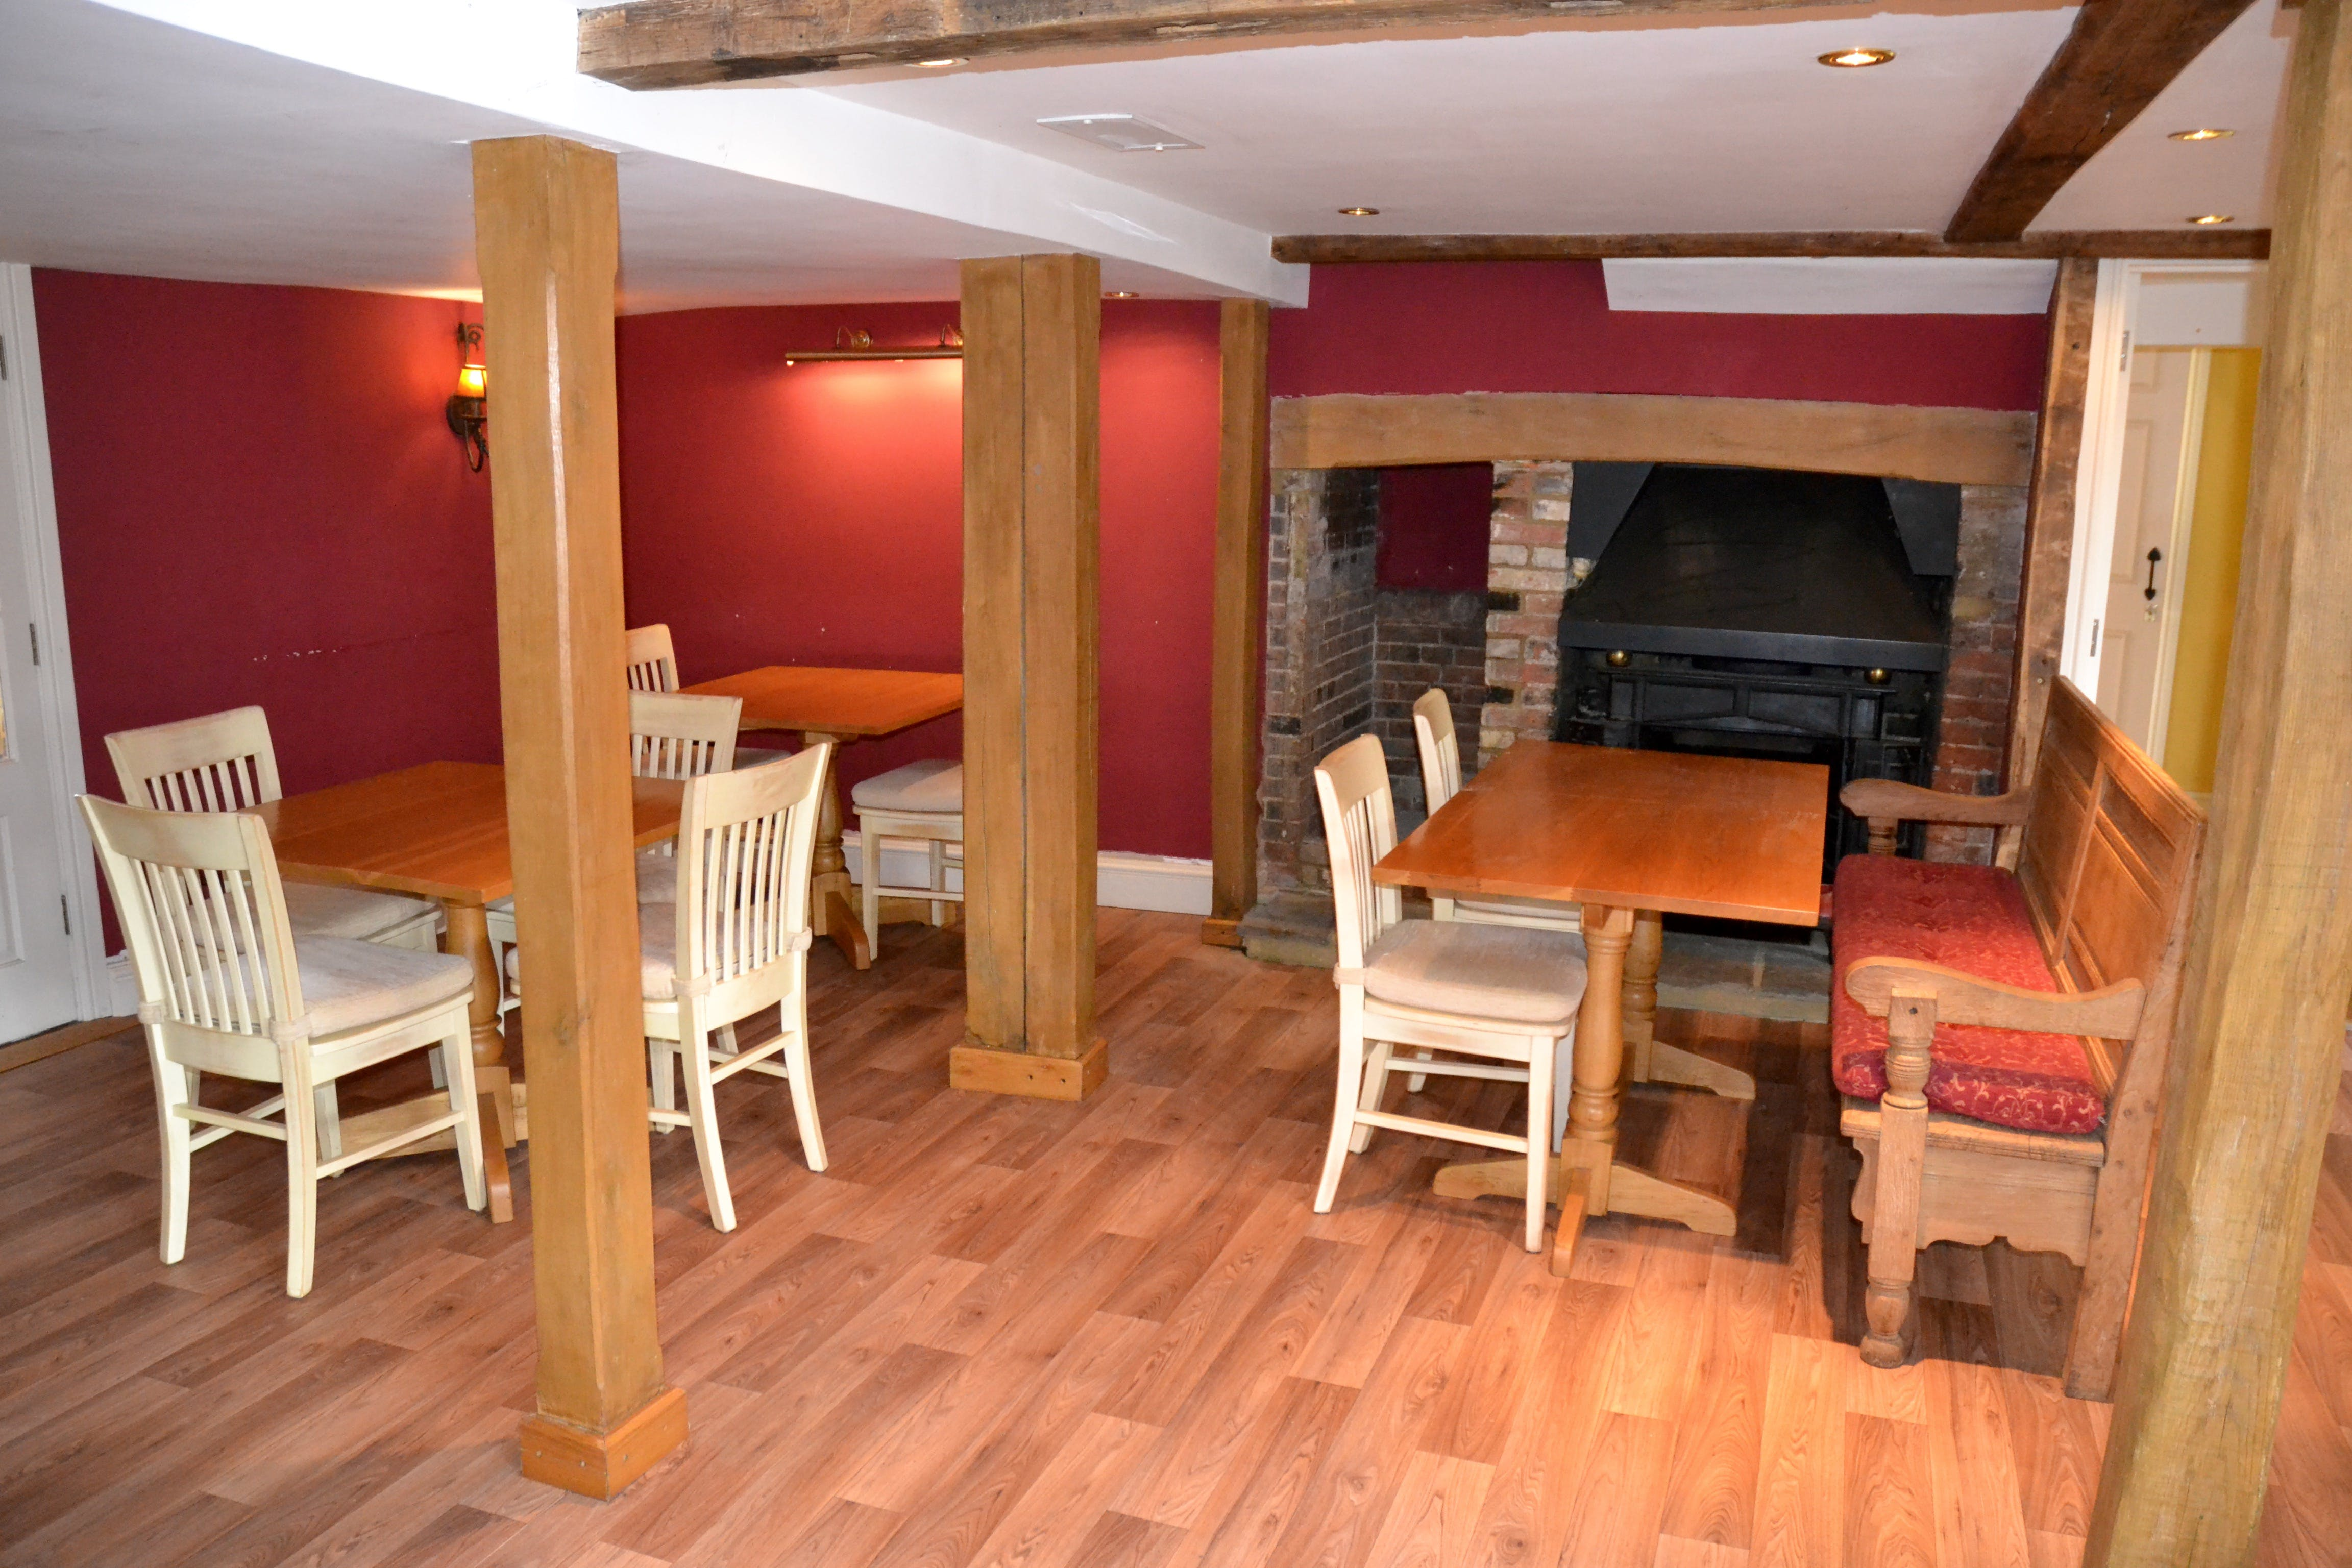 The Crown Inn, Tenterden, Leisure / Retail For Sale - DSC_0040.jpg